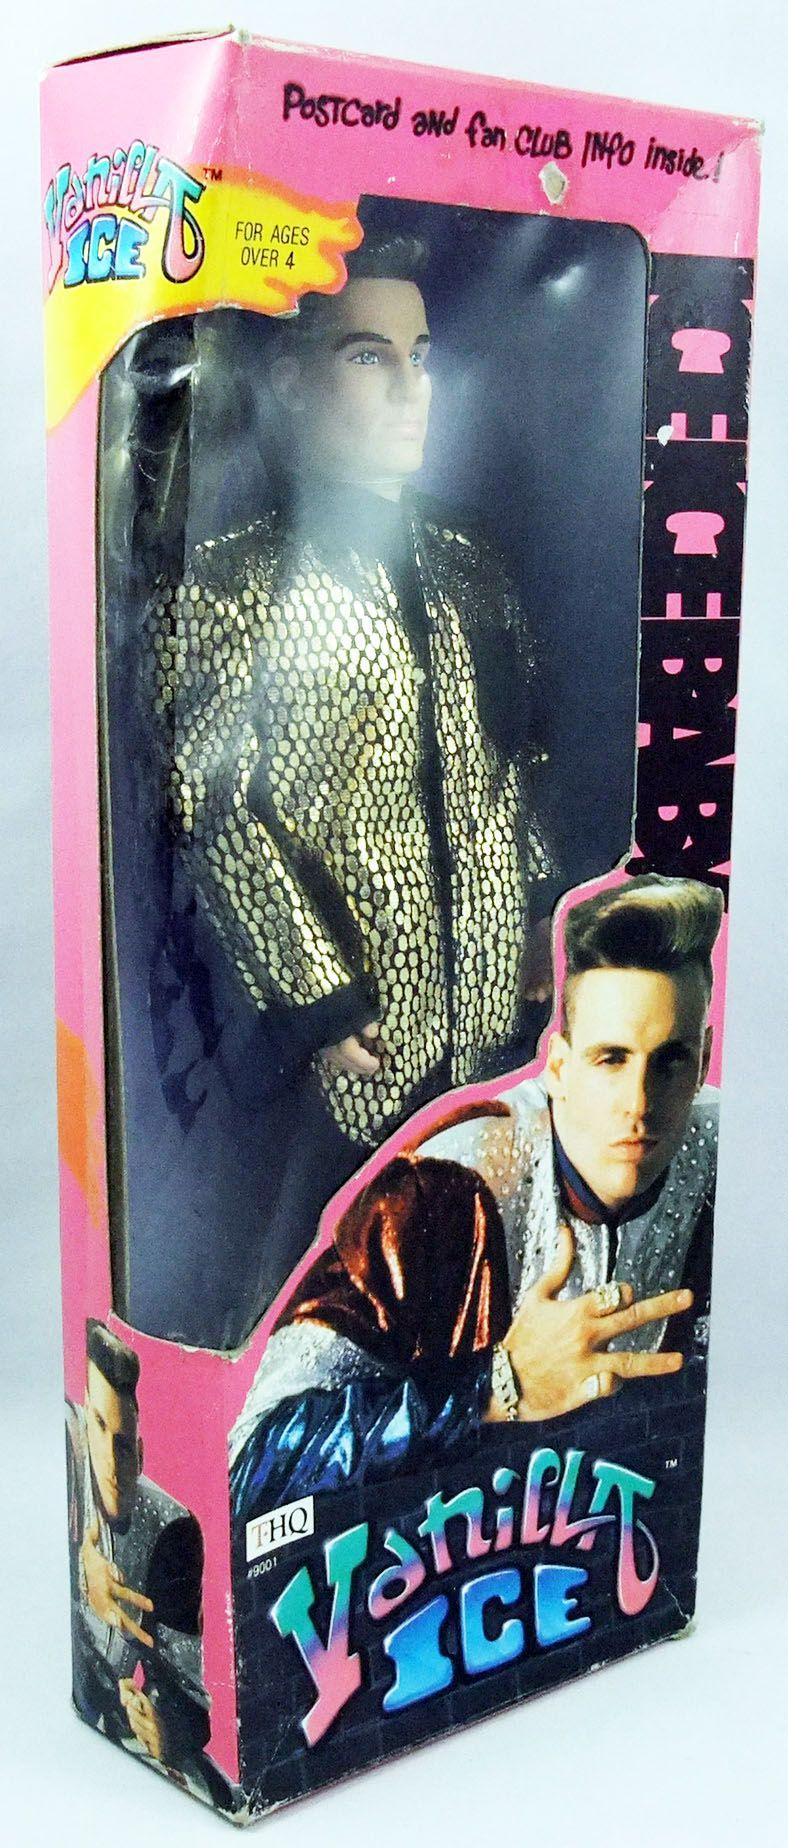 Vanilla Ice - Poupée 30cm (neuve en boite) - THQ 1991